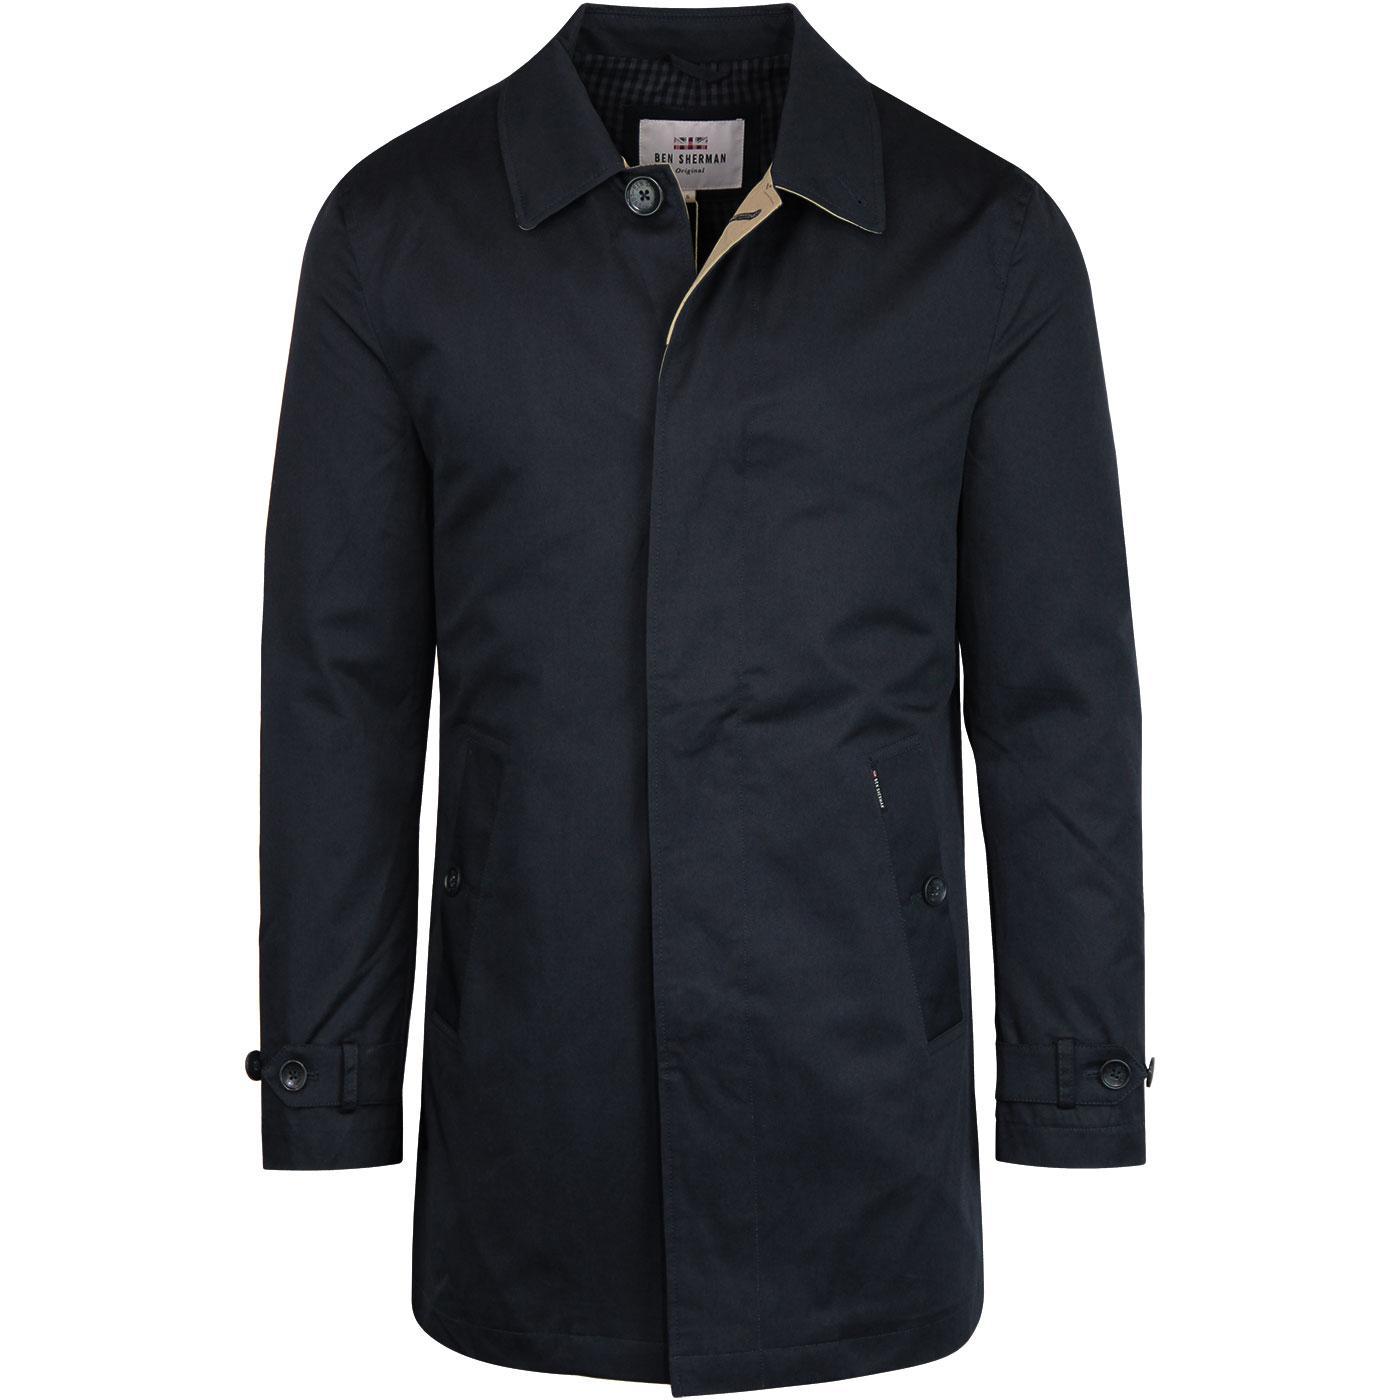 BEN SHERMAN Men's Retro Mod New Mac Coat (Navy)